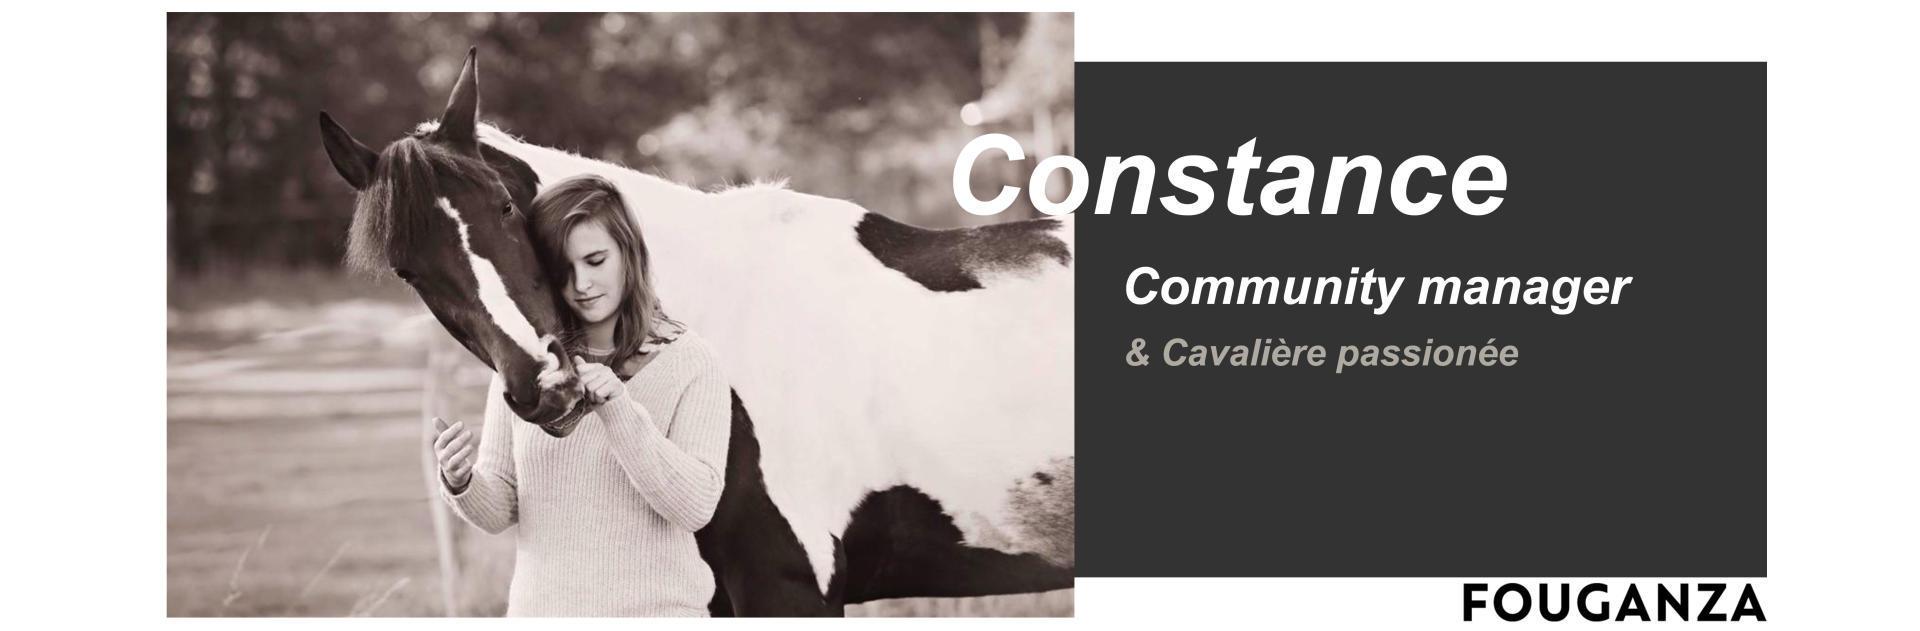 Alt/itw constance